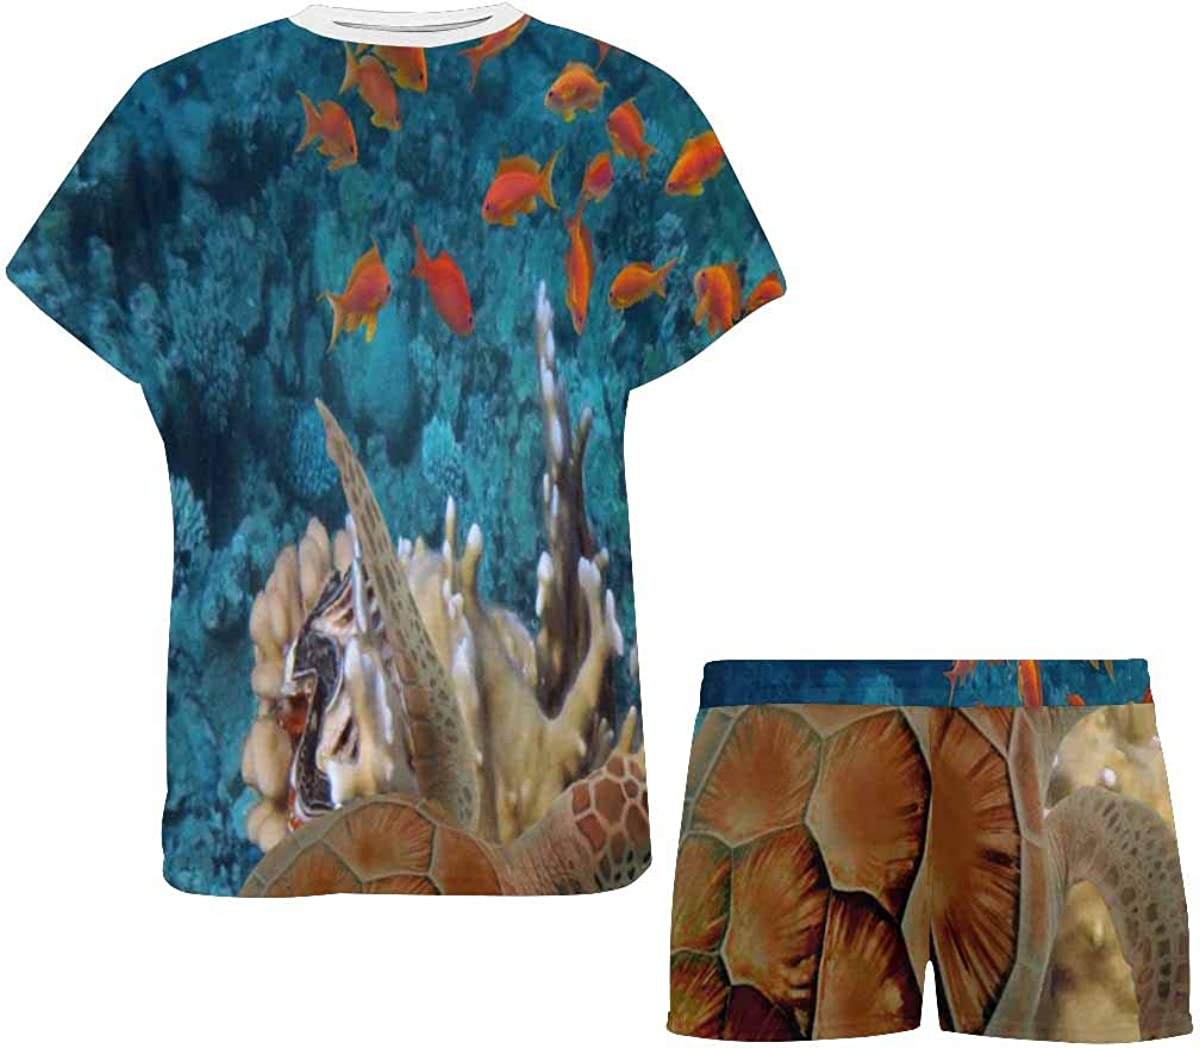 INTERESTPRINT Coral Reef with Fishes, Turtle Women Sleepwear Short Sleeves Pajama Sets